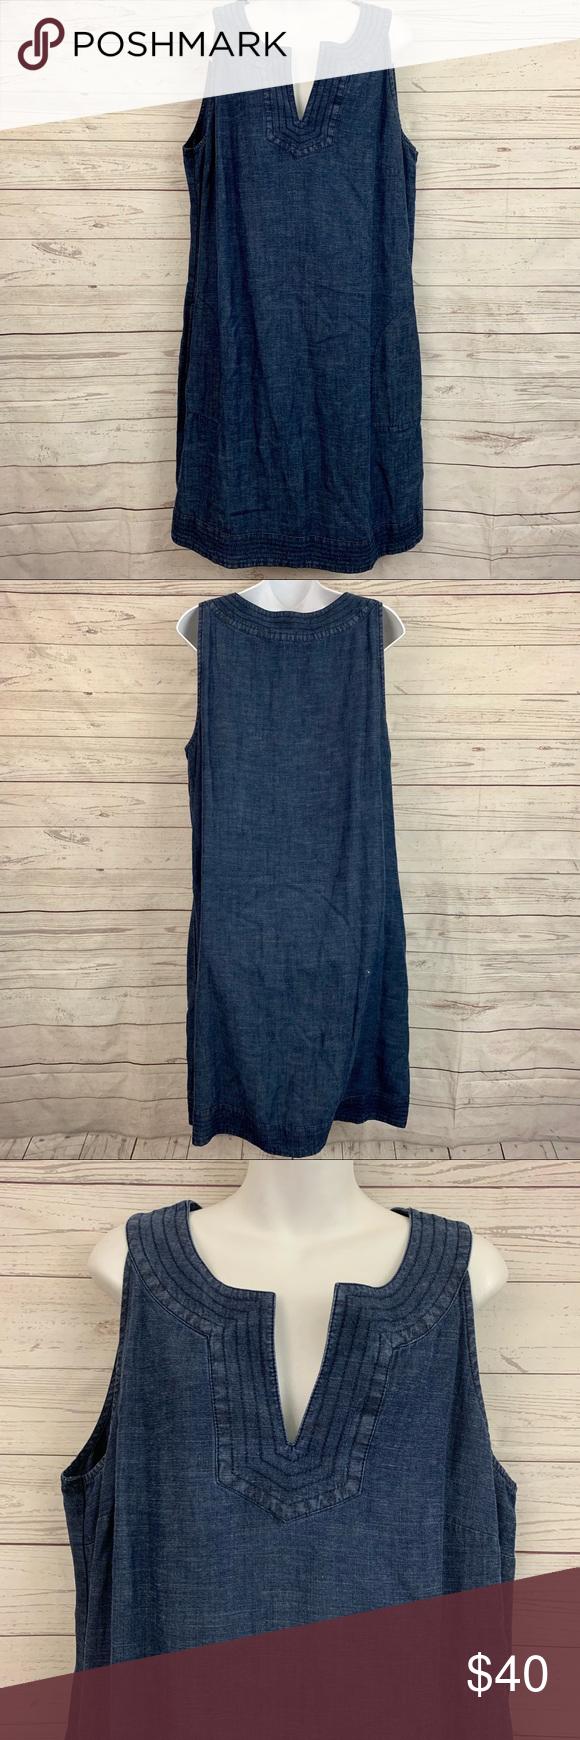 b7128dc4920 J. Jill denim chambray shift dress pockets tencel Great condition. Size XL  TALL.